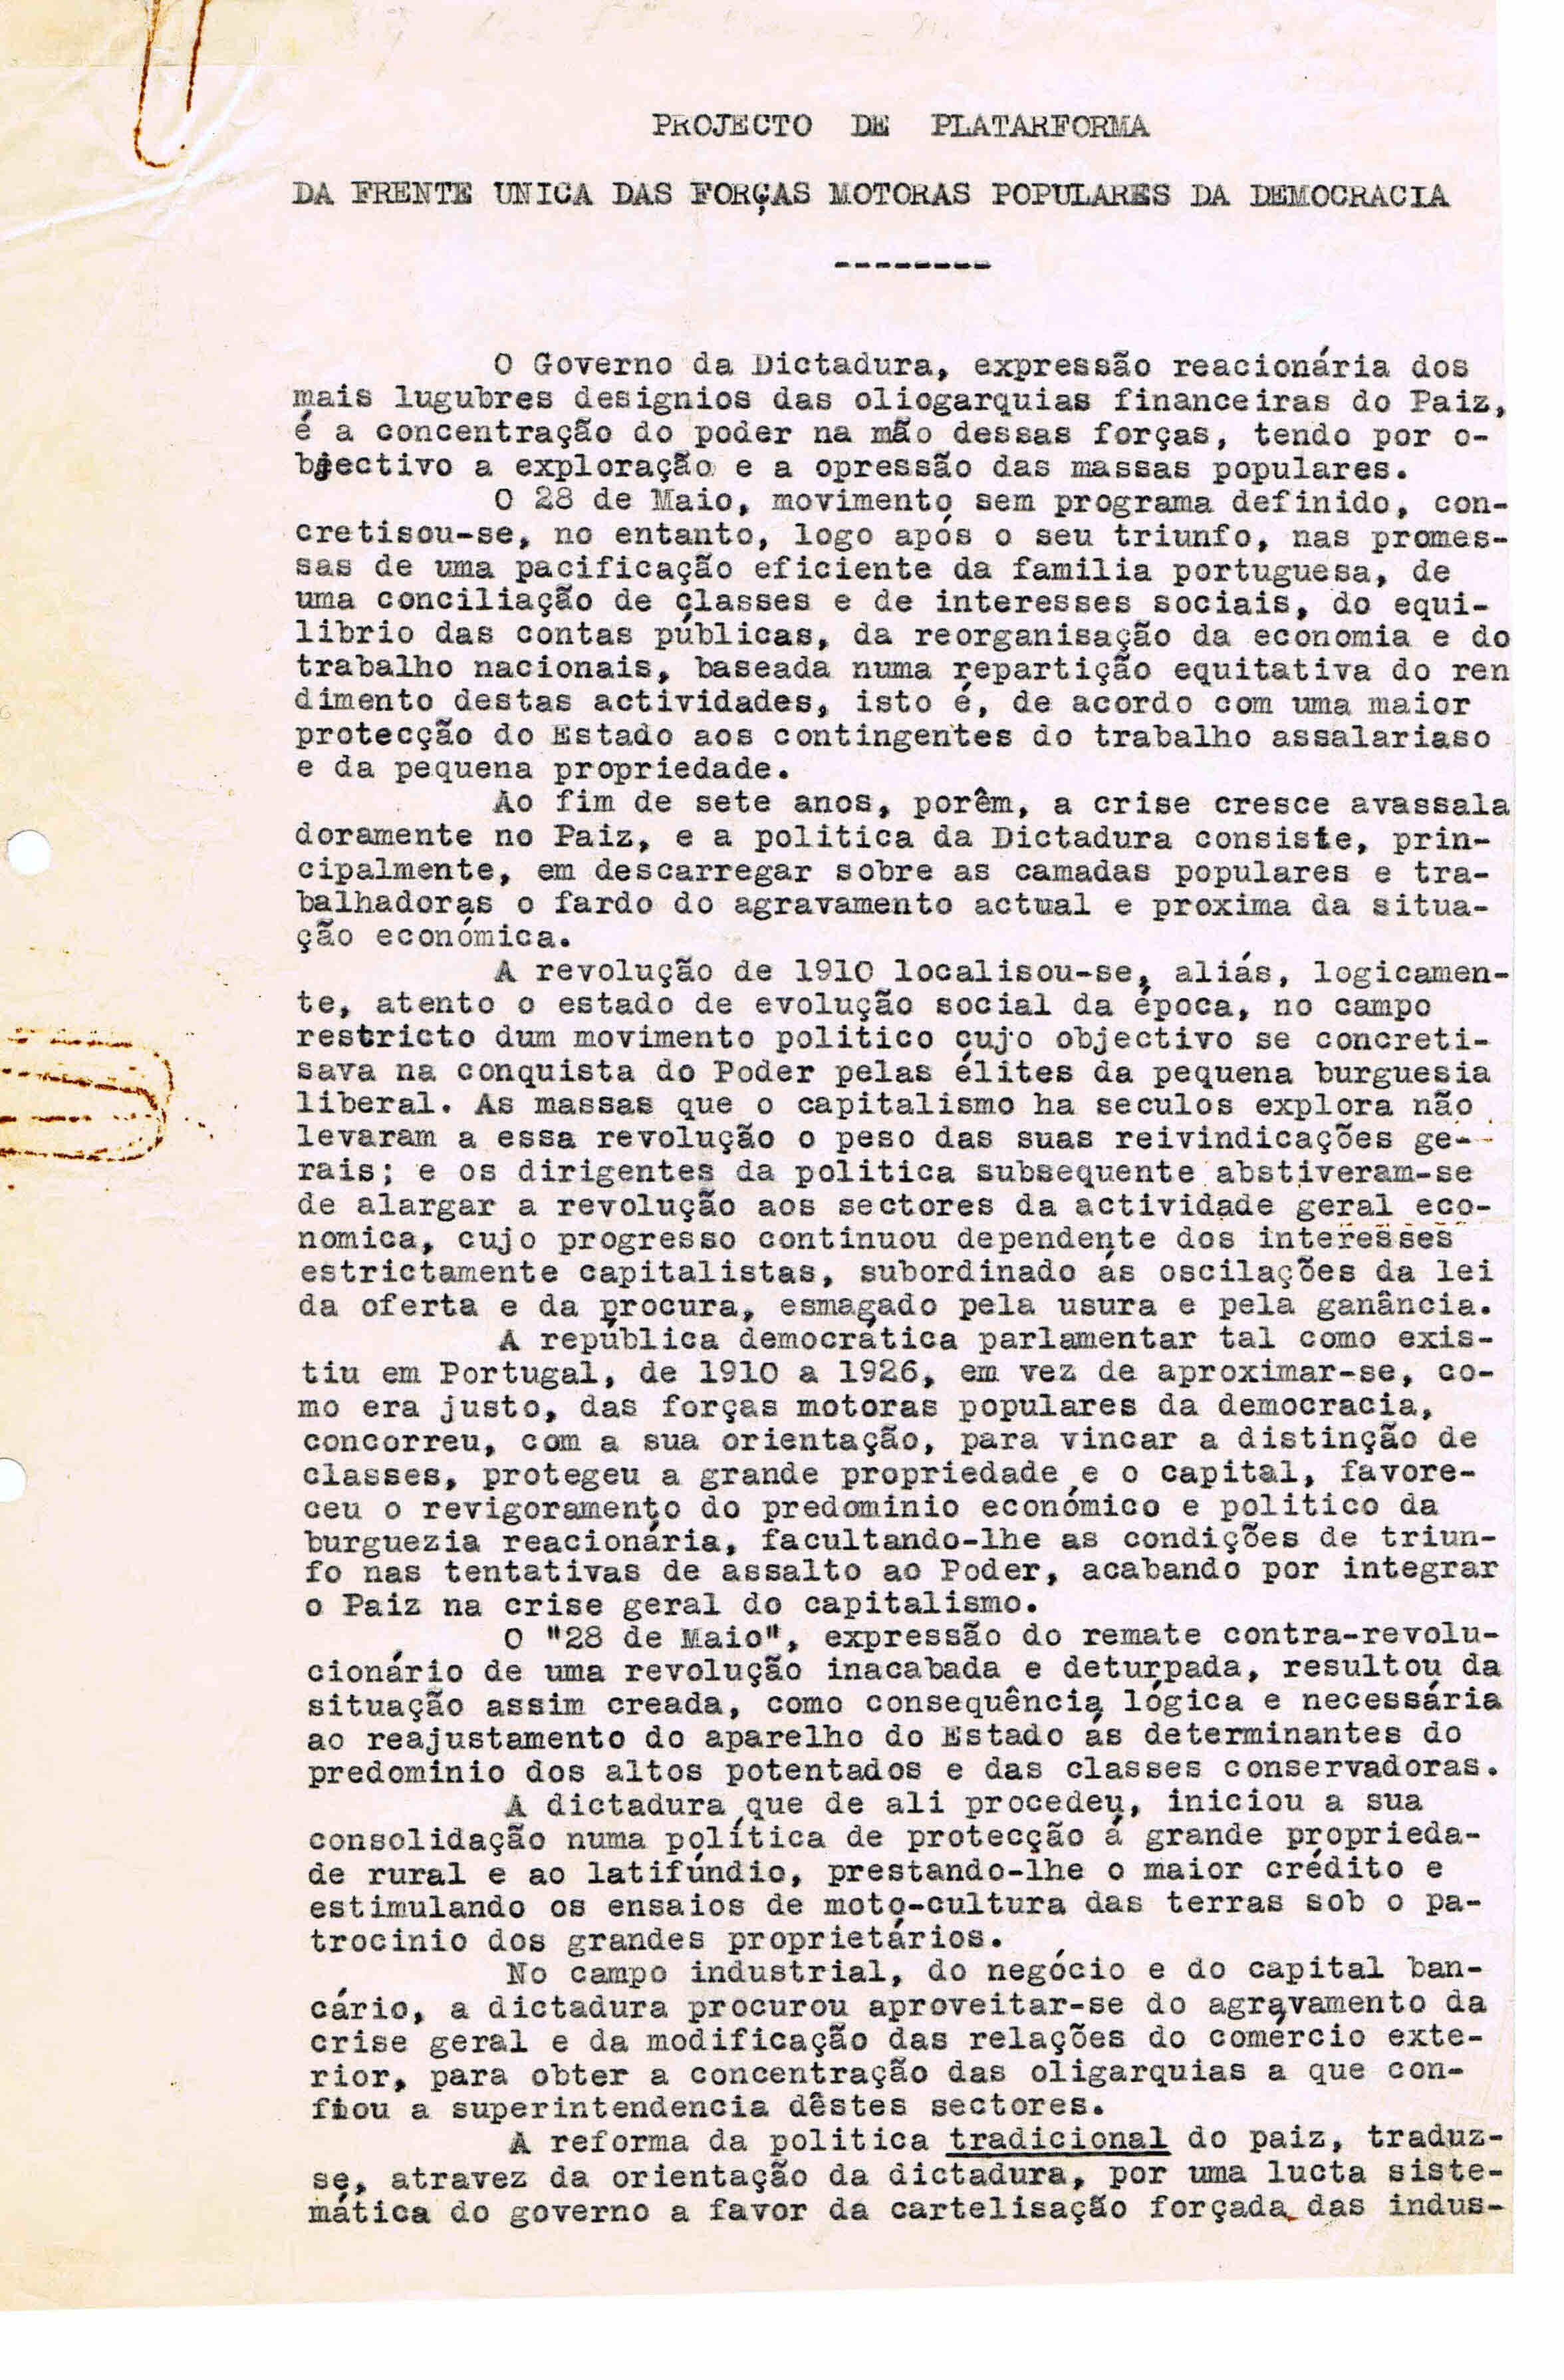 Copy of Document (135) (2)